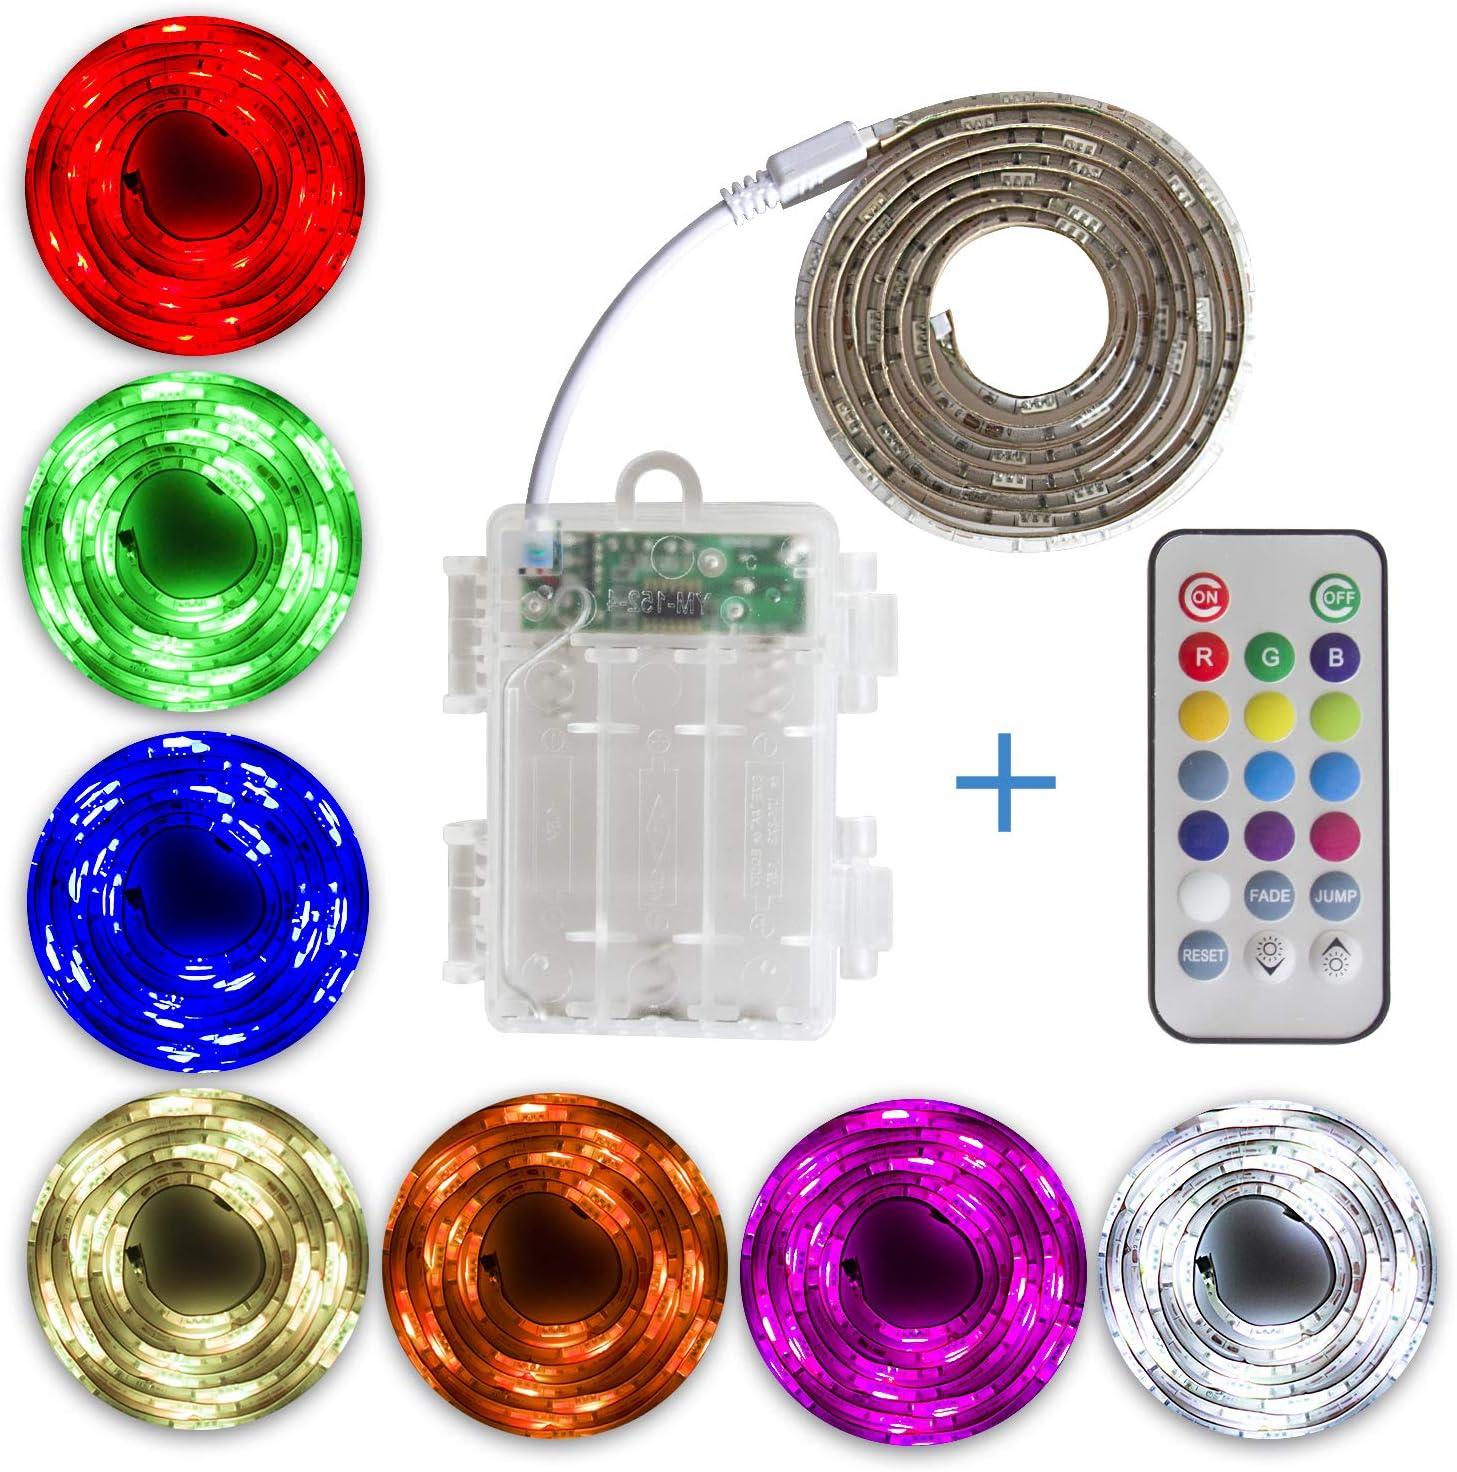 SUMAITEC Waterproof LED RGB High order Strip Multi with Battery Box Boston Mall Lights